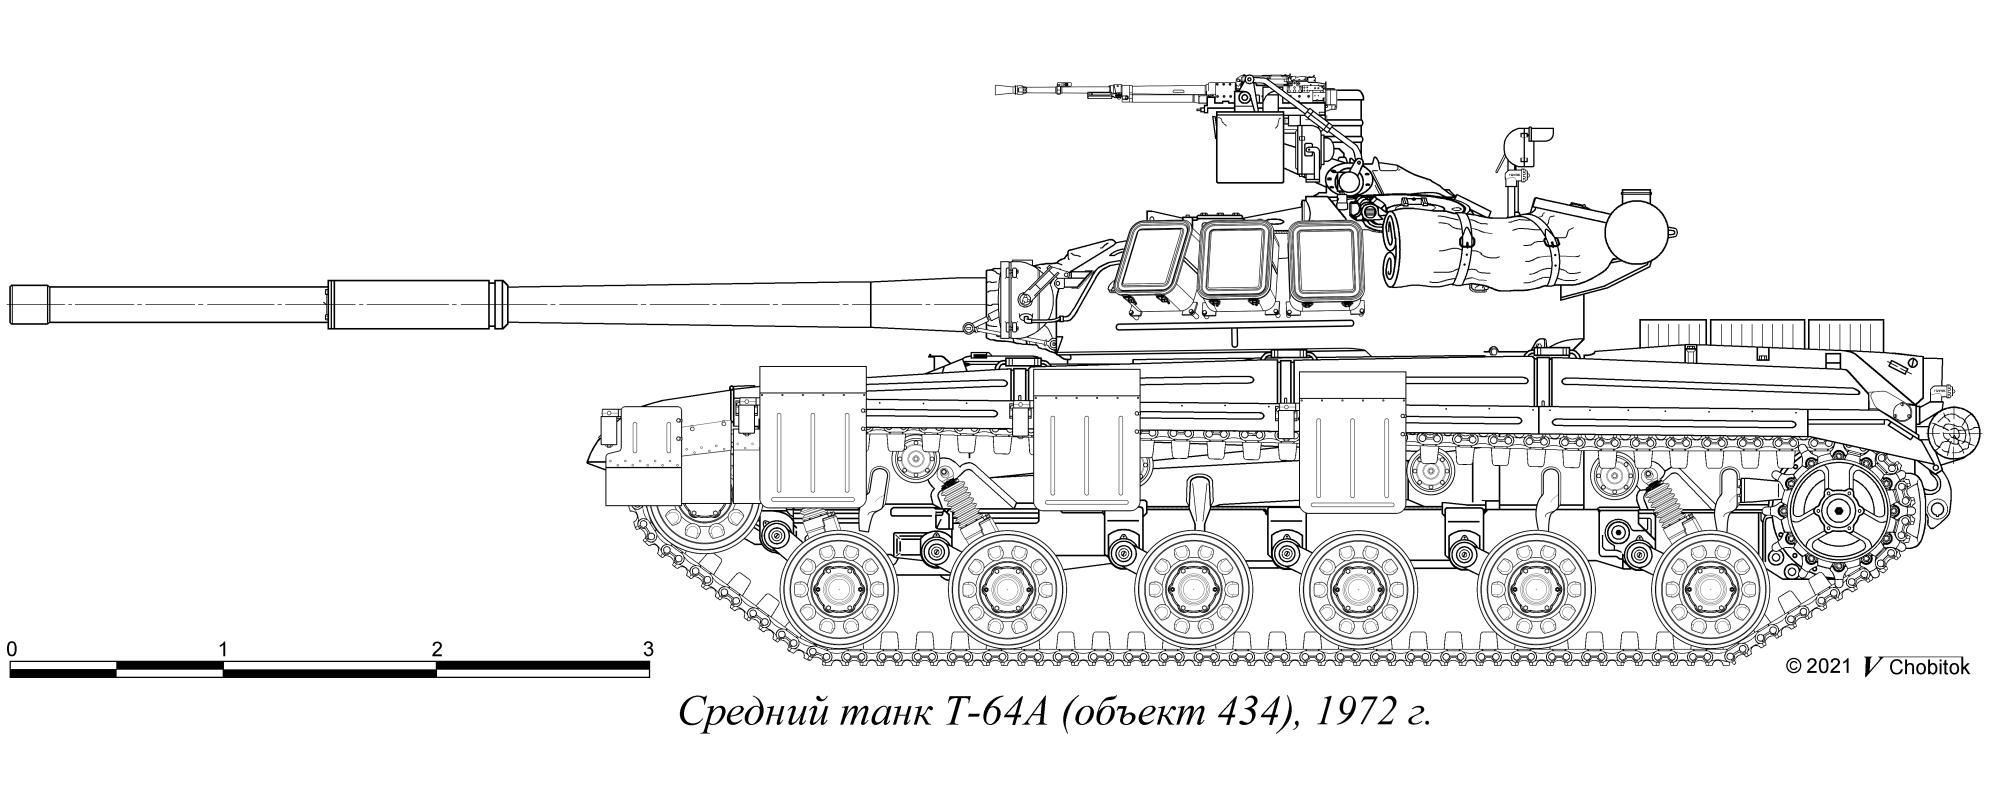 http://armor.kiev.ua/Tanks/Modern/T64/1971/434_72_1.png